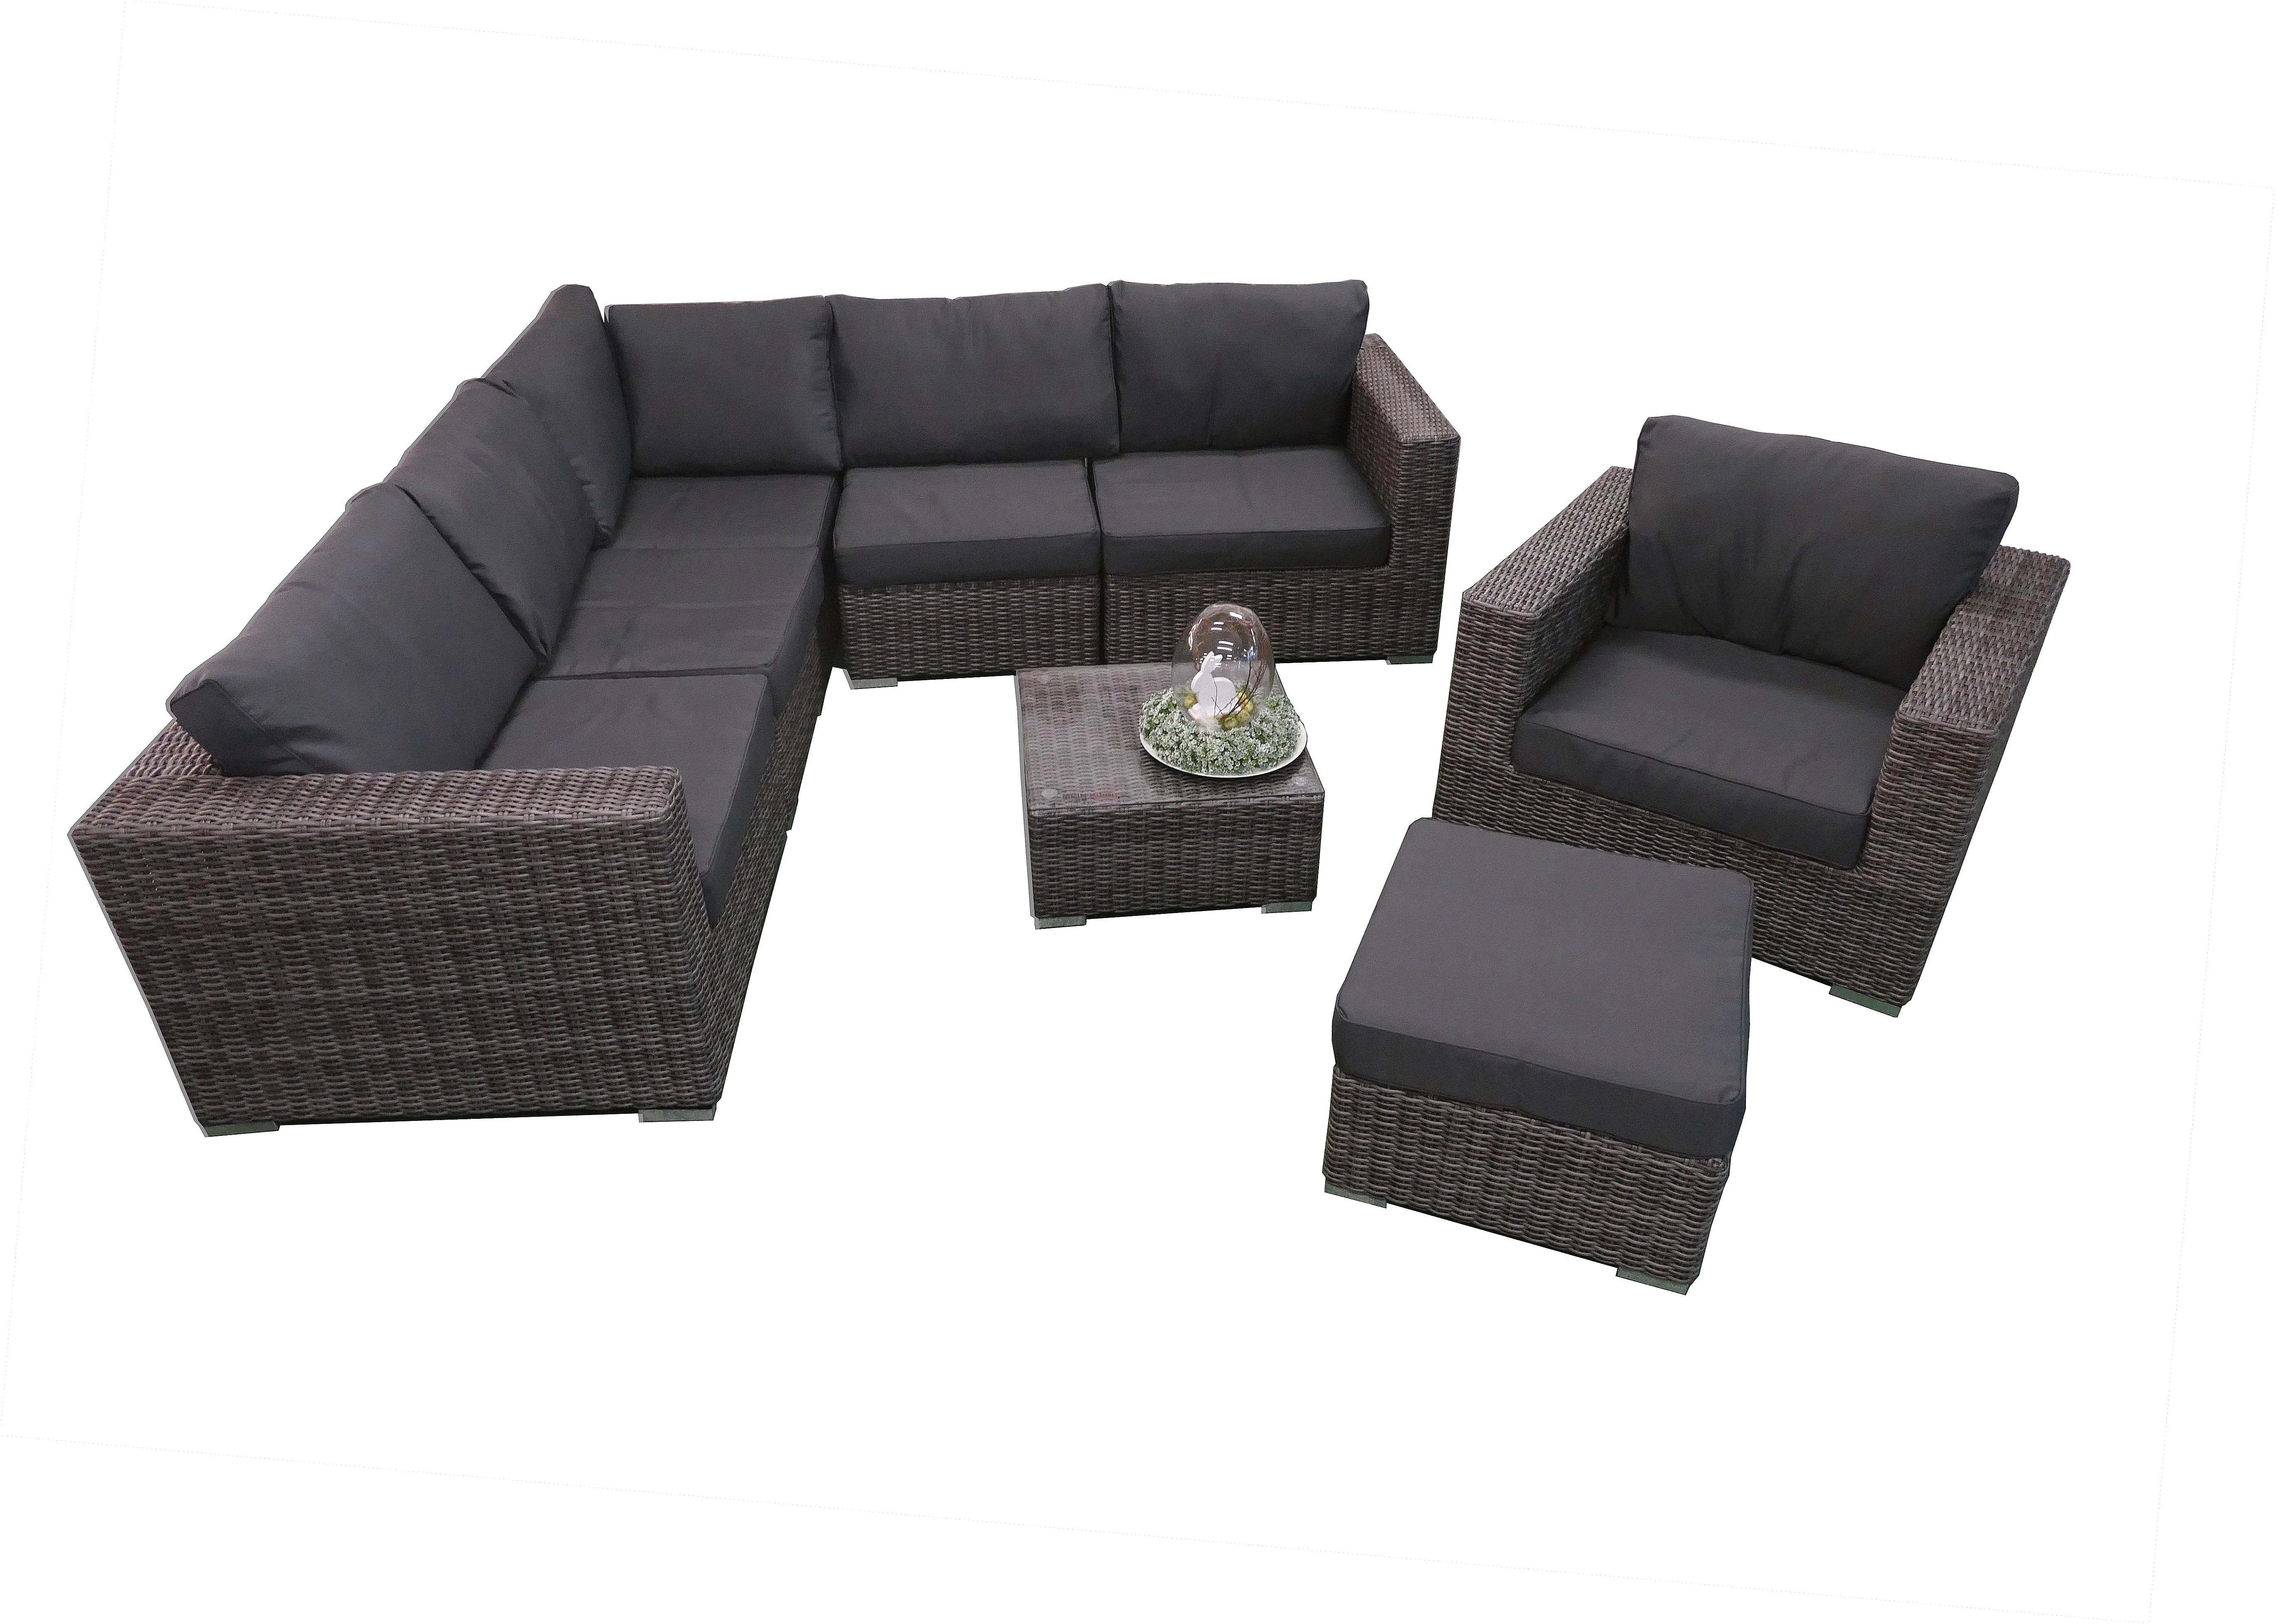 patio sofa cover fresh sofa blau elegant patio chairs cushions new wicker outdoor sofa 0d of